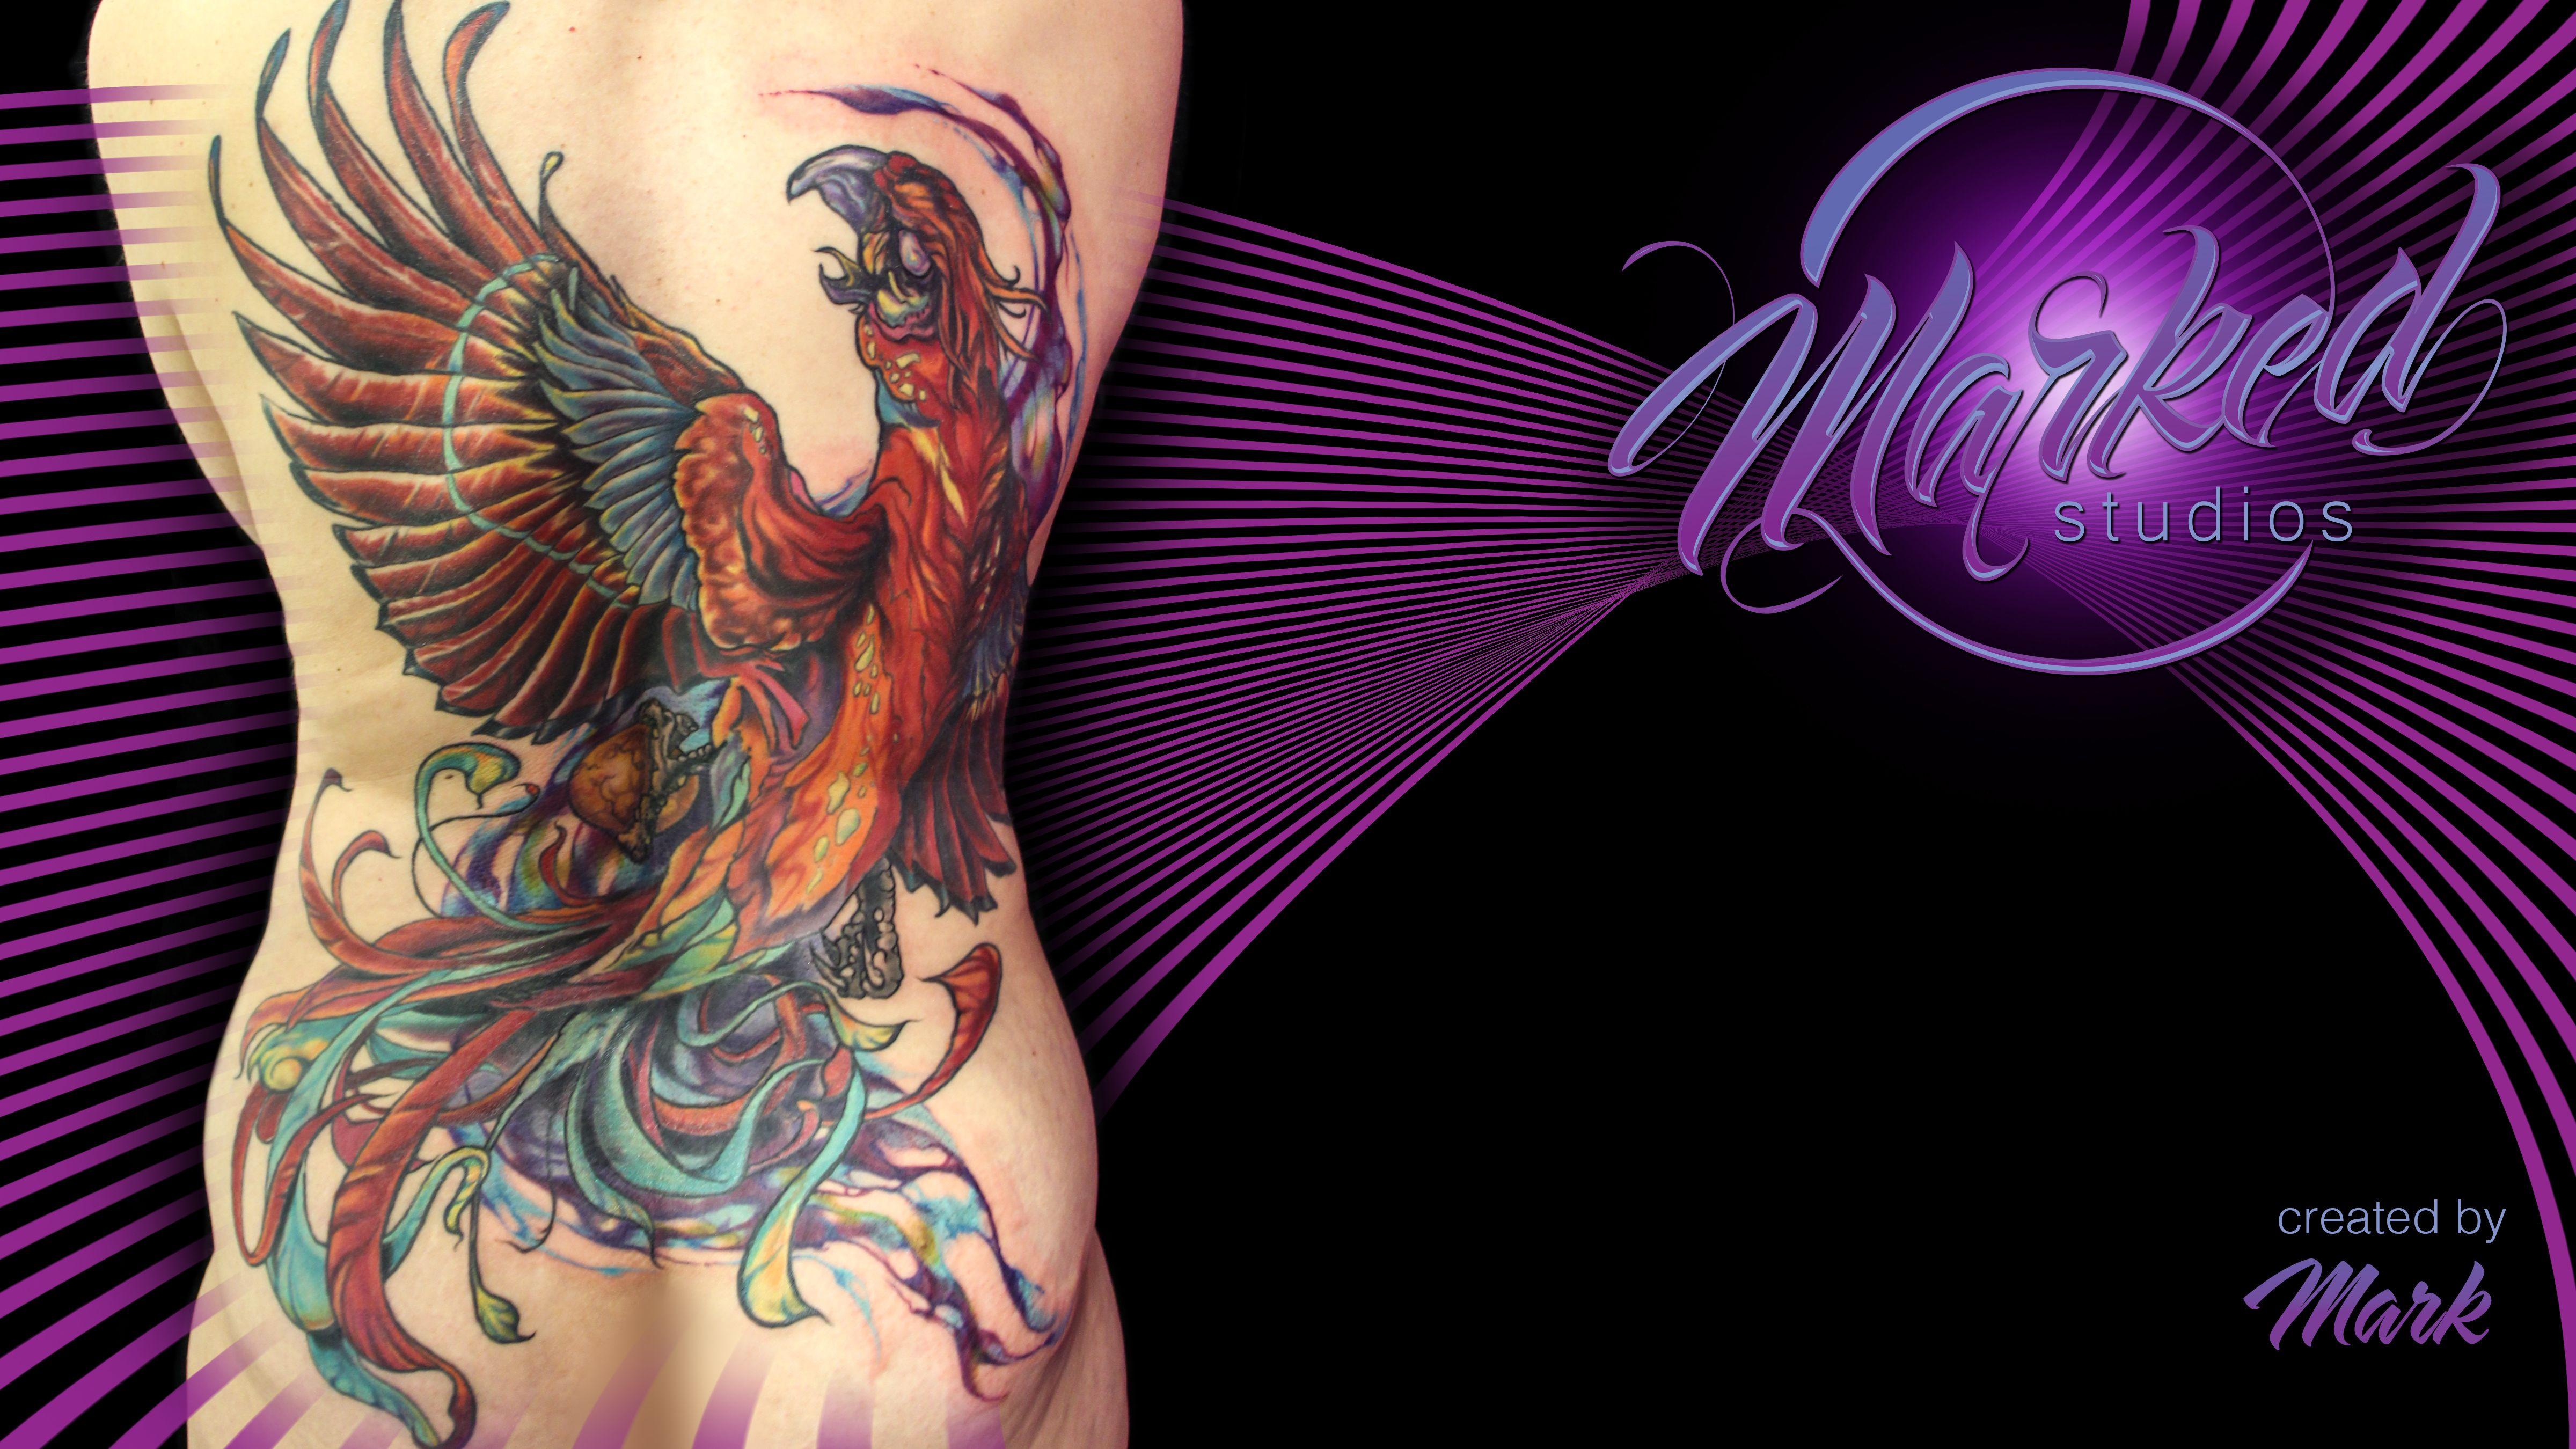 markedstudios #tattoo #renotattoo #tattooredefined #reno #bodyart ...